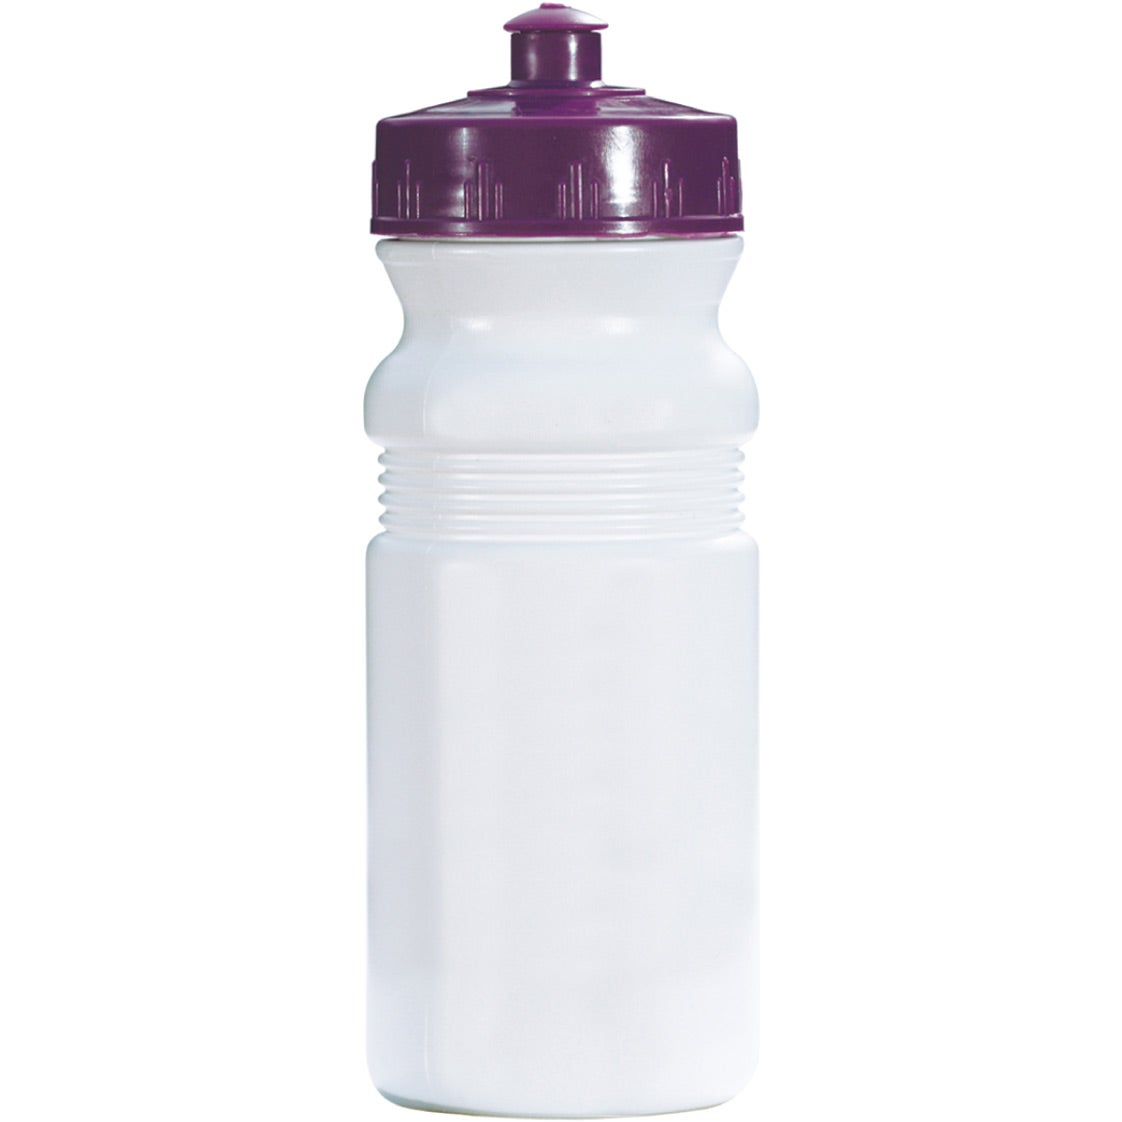 Eco Aware Biodegradable Bike Bottle (20 Oz.)